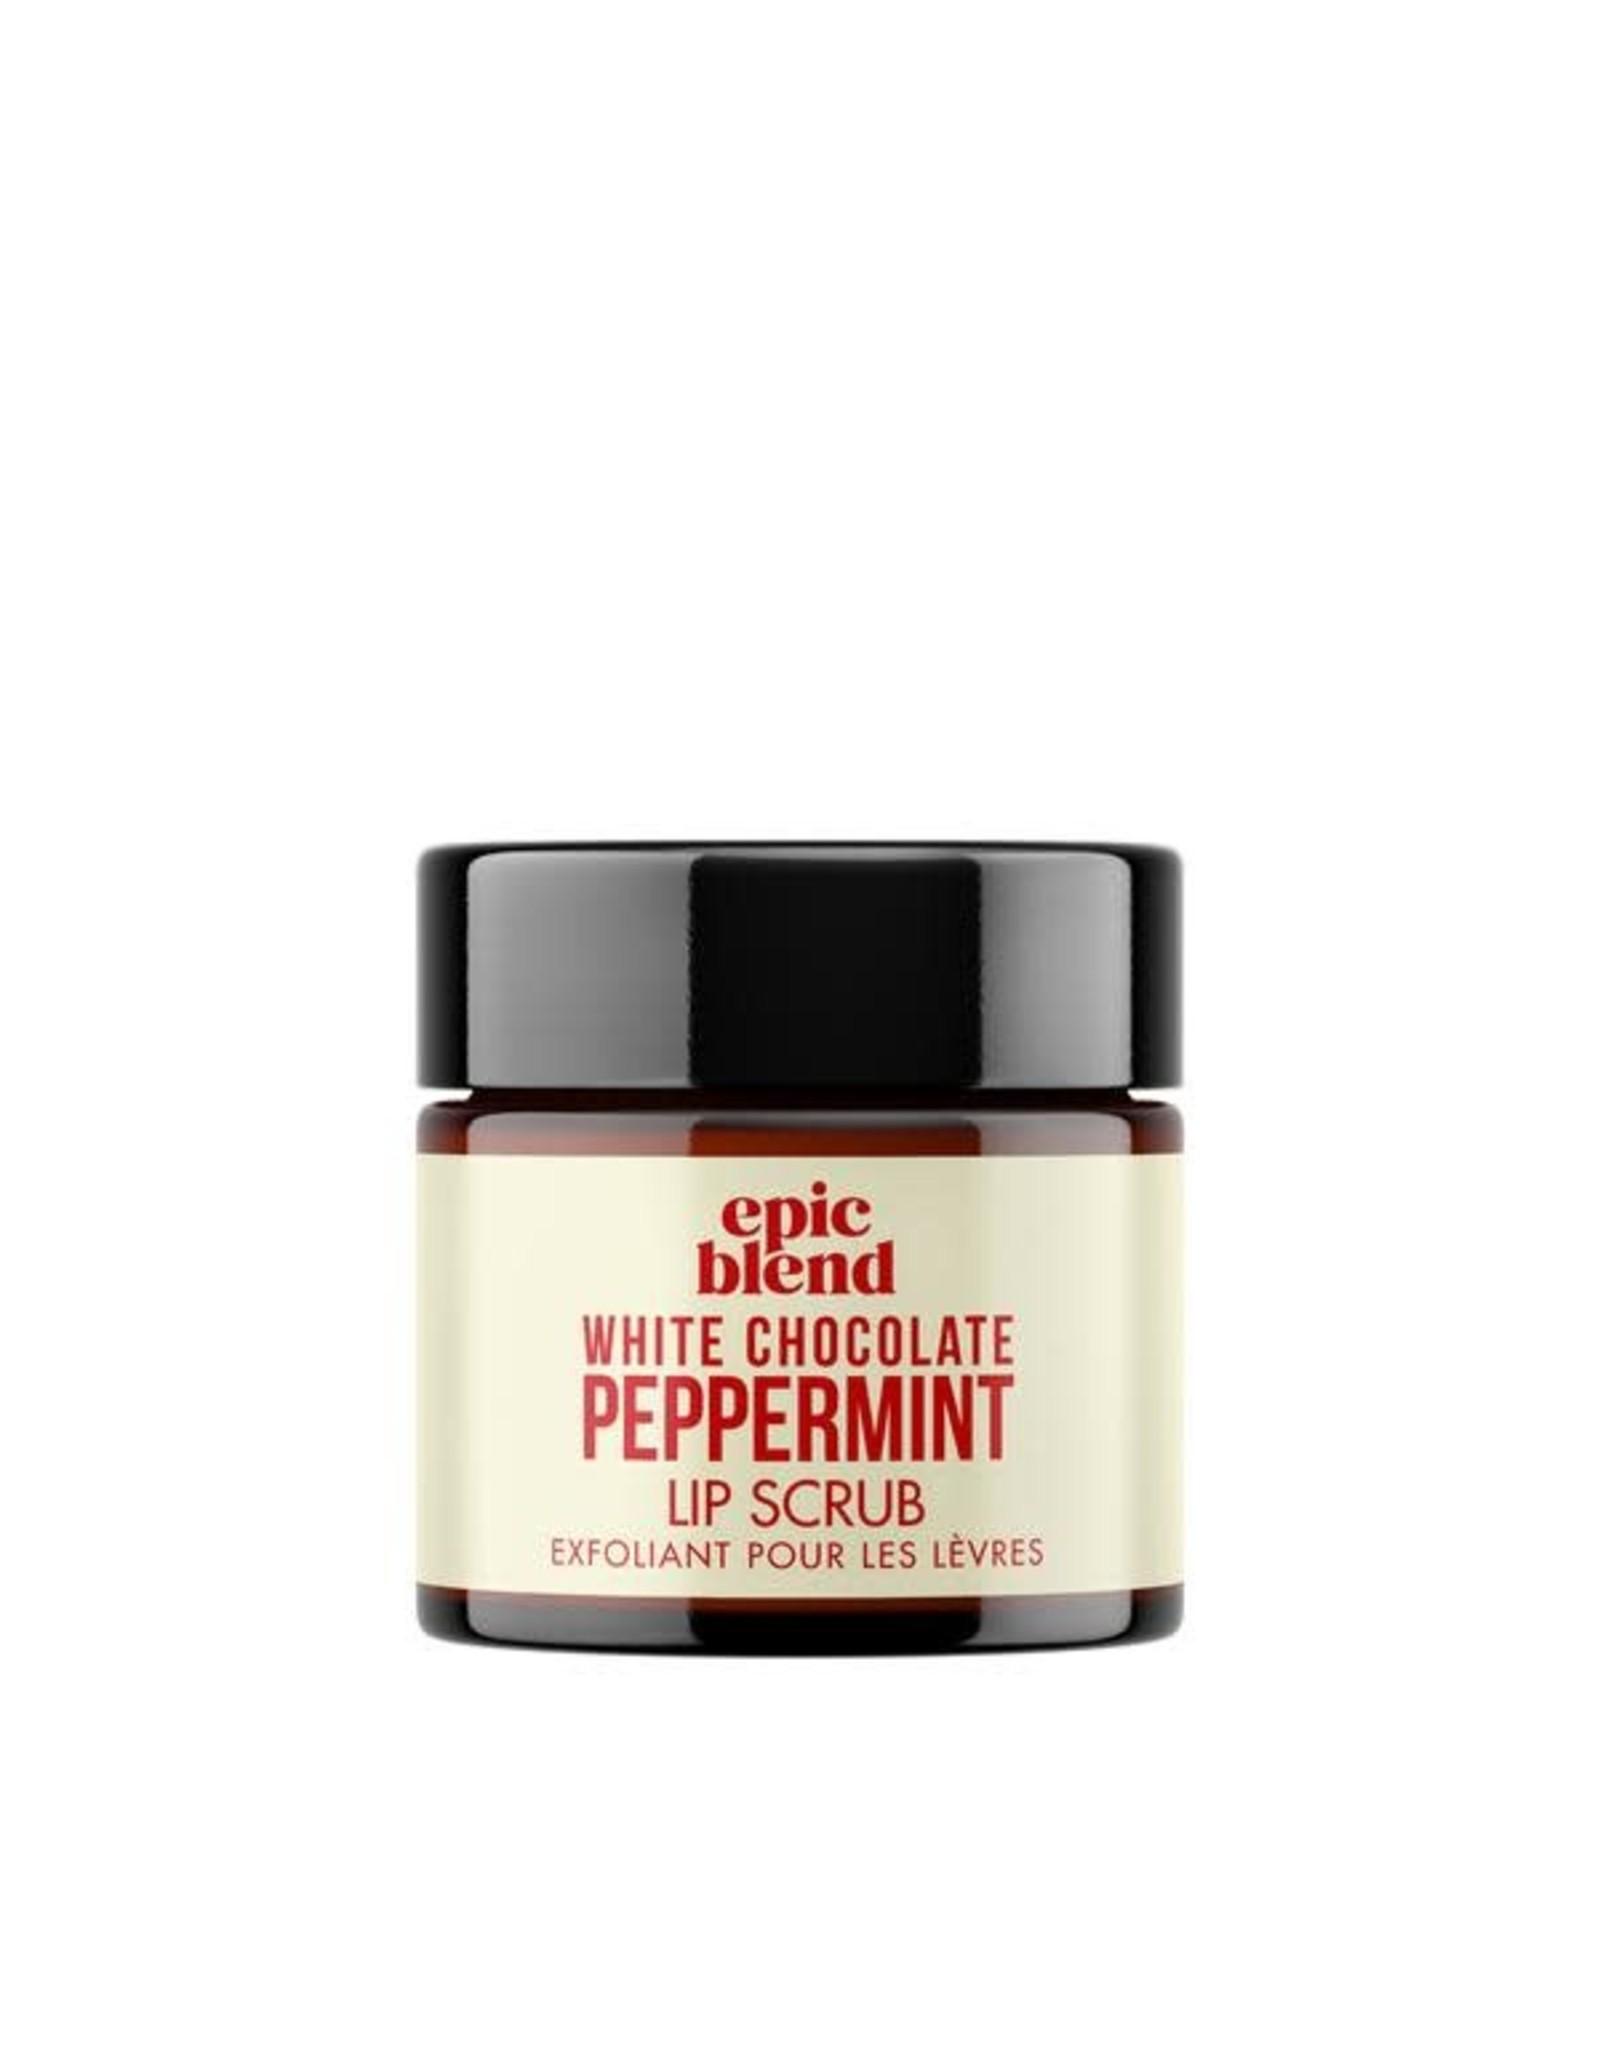 Epic Blend White Chocolate Peppermint Lip Scrub